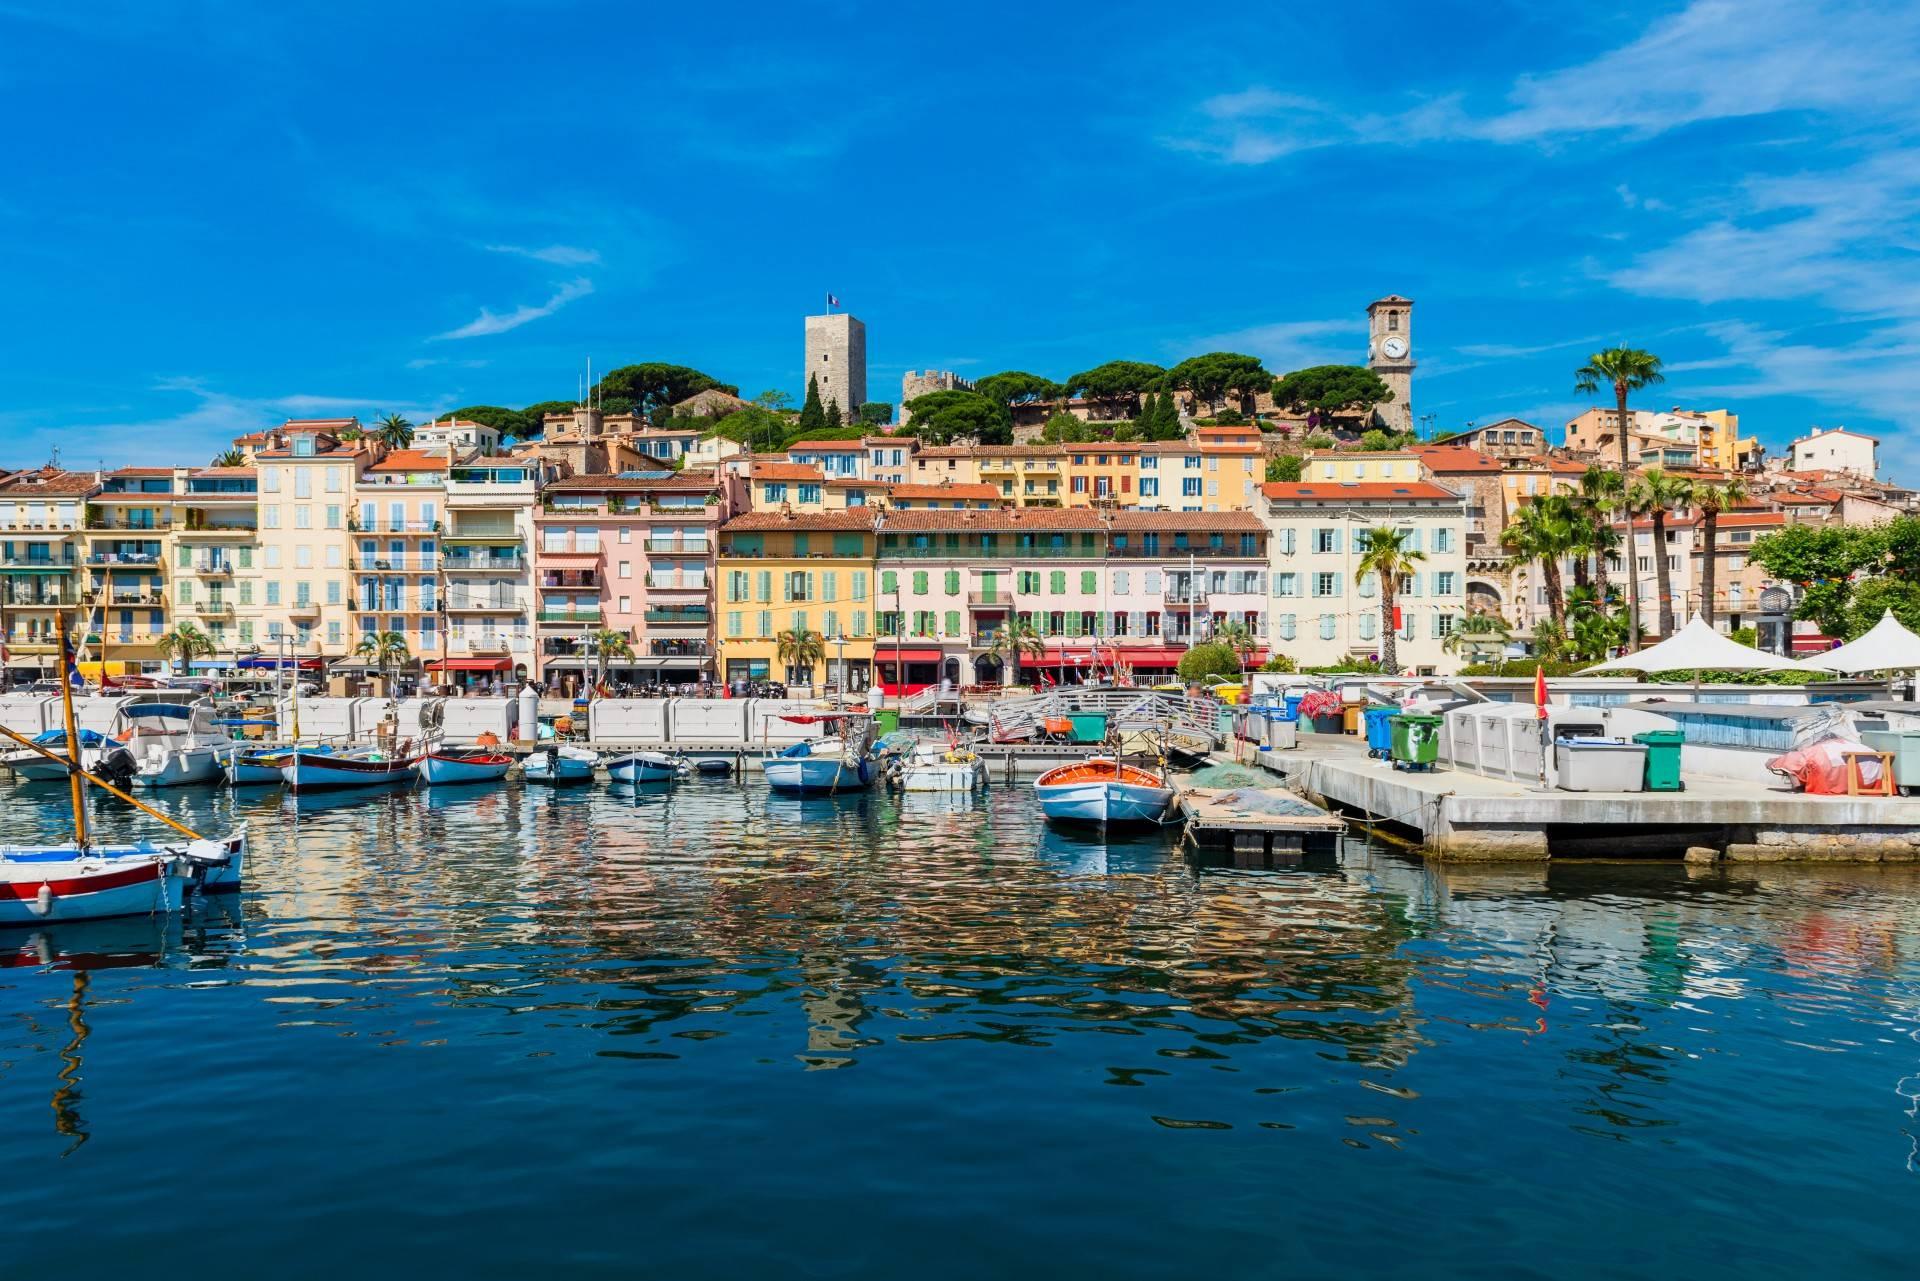 Sightseeing tours Cannes, Antibes, Saint Paul de Vence